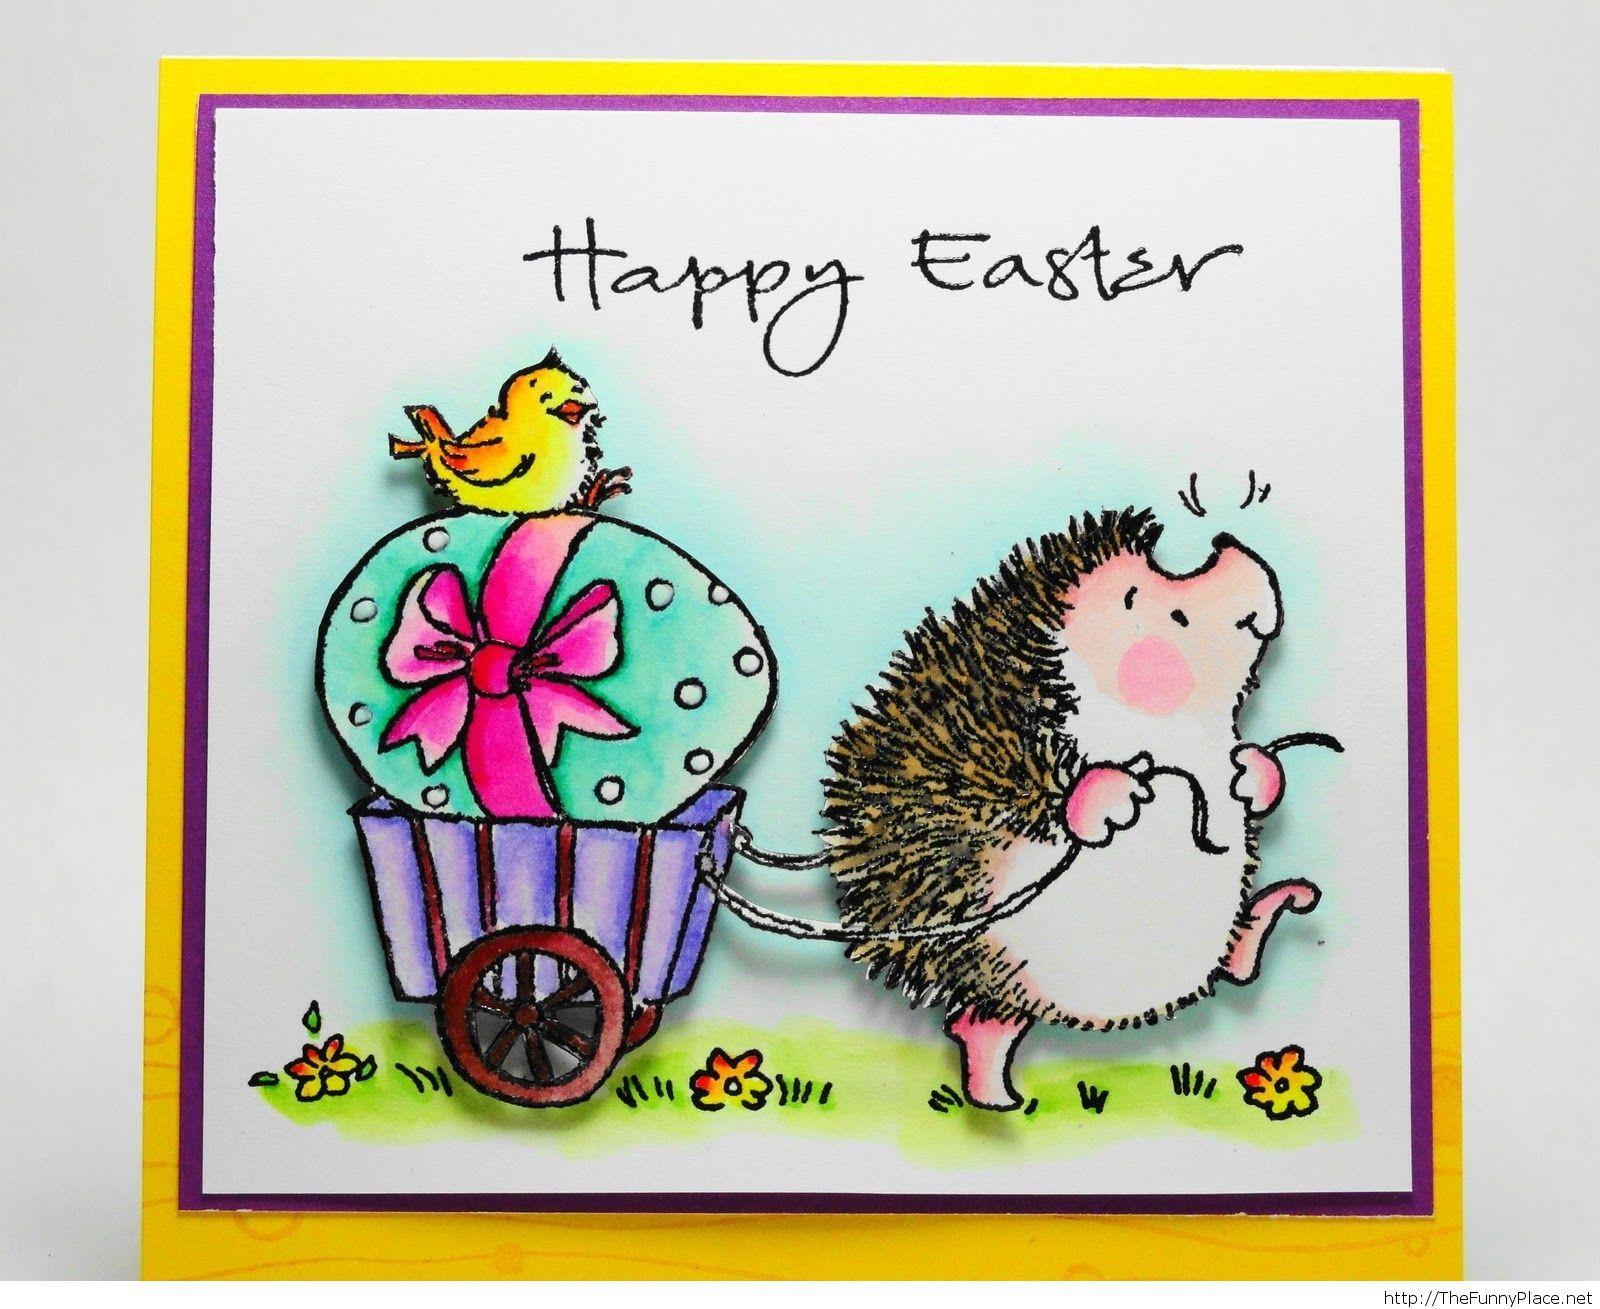 Happy Easter animals wallpaper